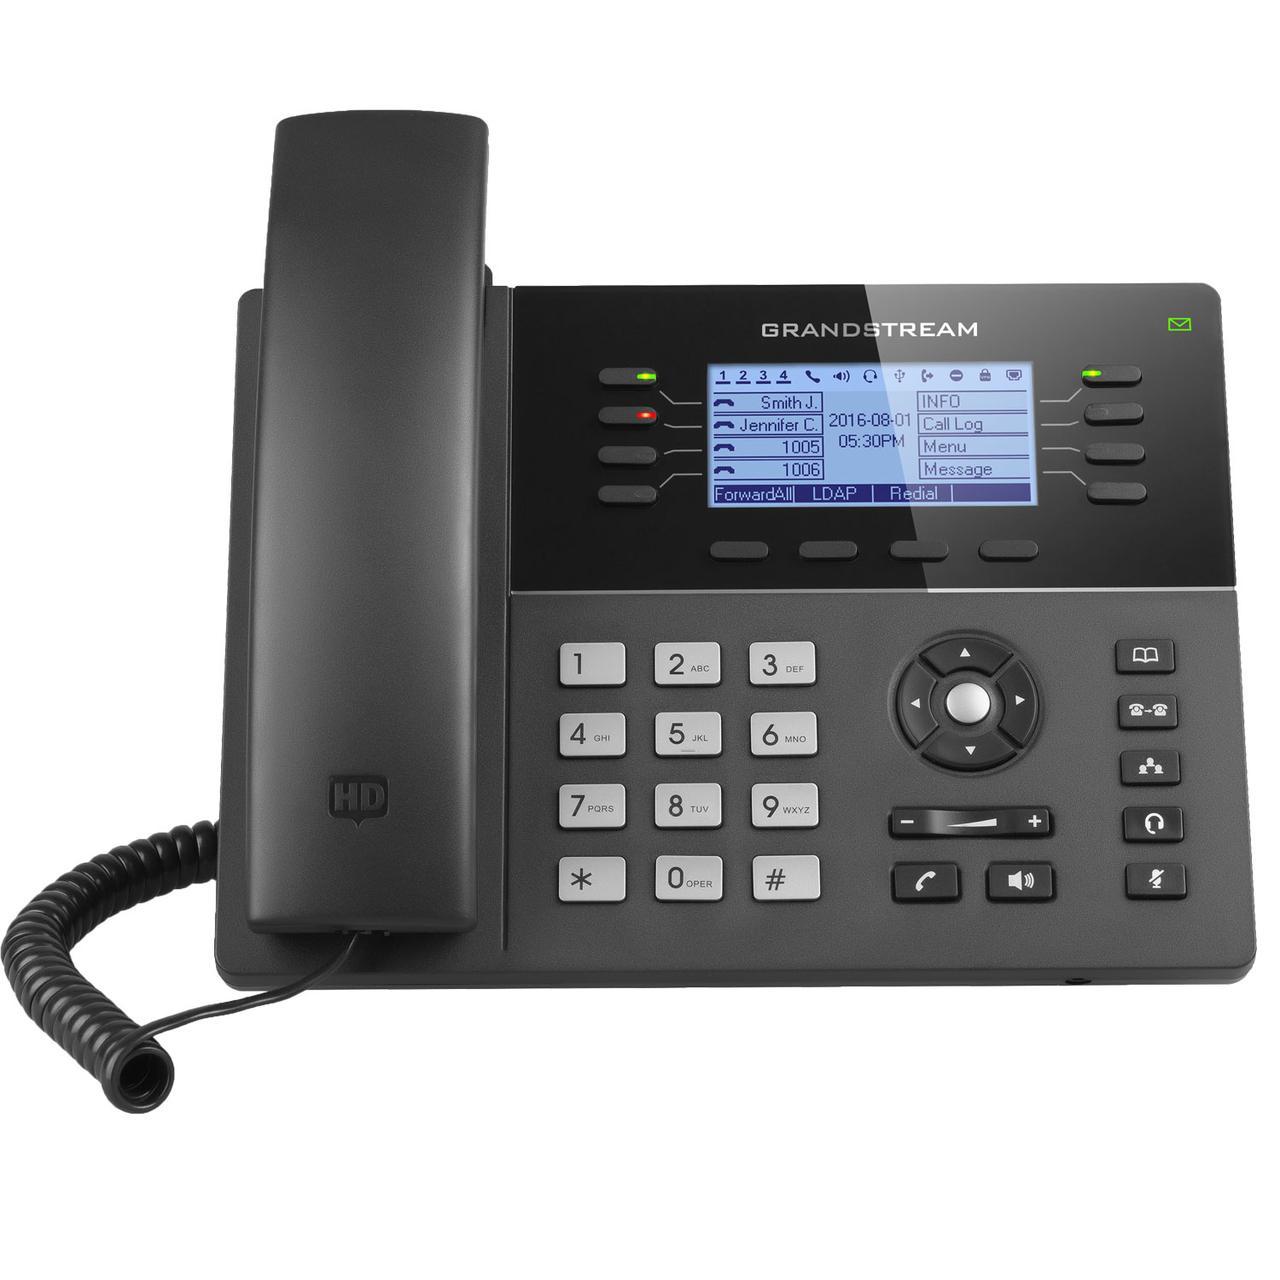 Grandstream GXP1782 IP телефон 4 SIP аккаунта, 8 линий, PoE, (1GbE)Gigabit Ethernet, 32 virtual BLF